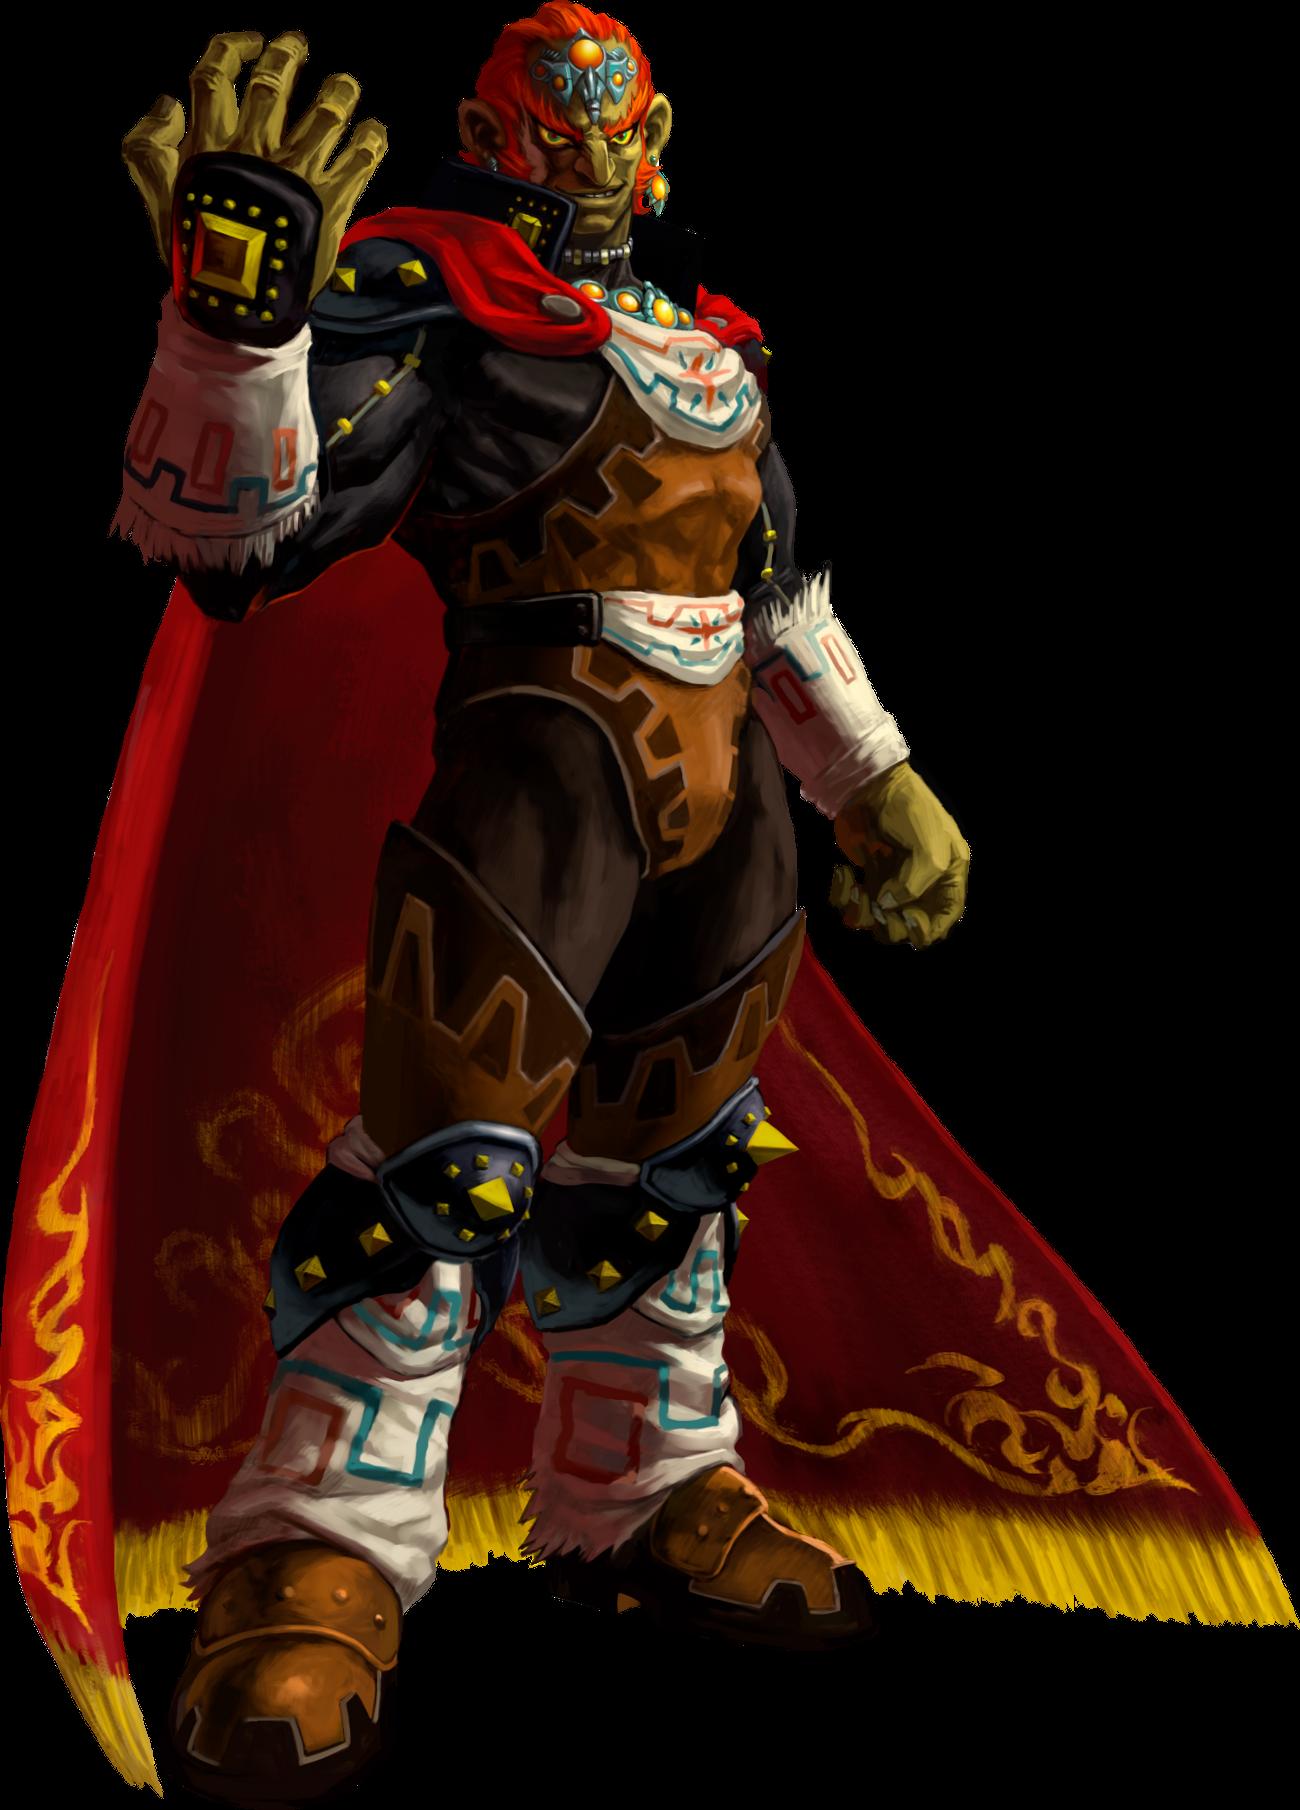 Ganondorf Ocarina Of Time Zeldapedia Fandom